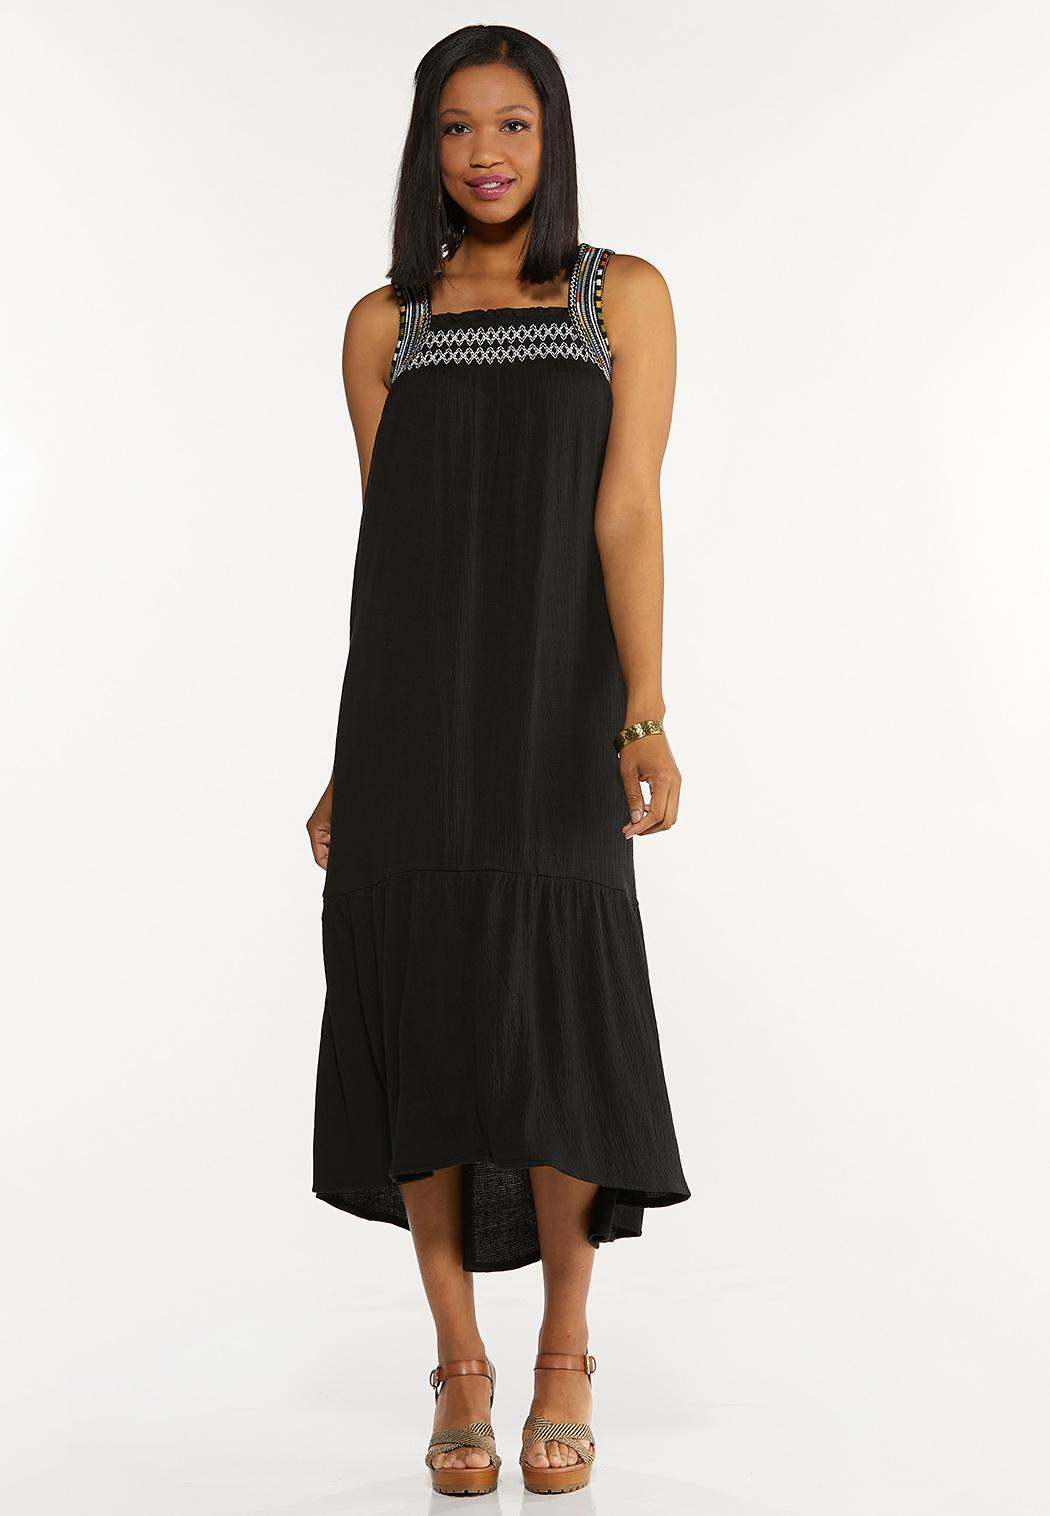 Gauzy Embroidered Dress